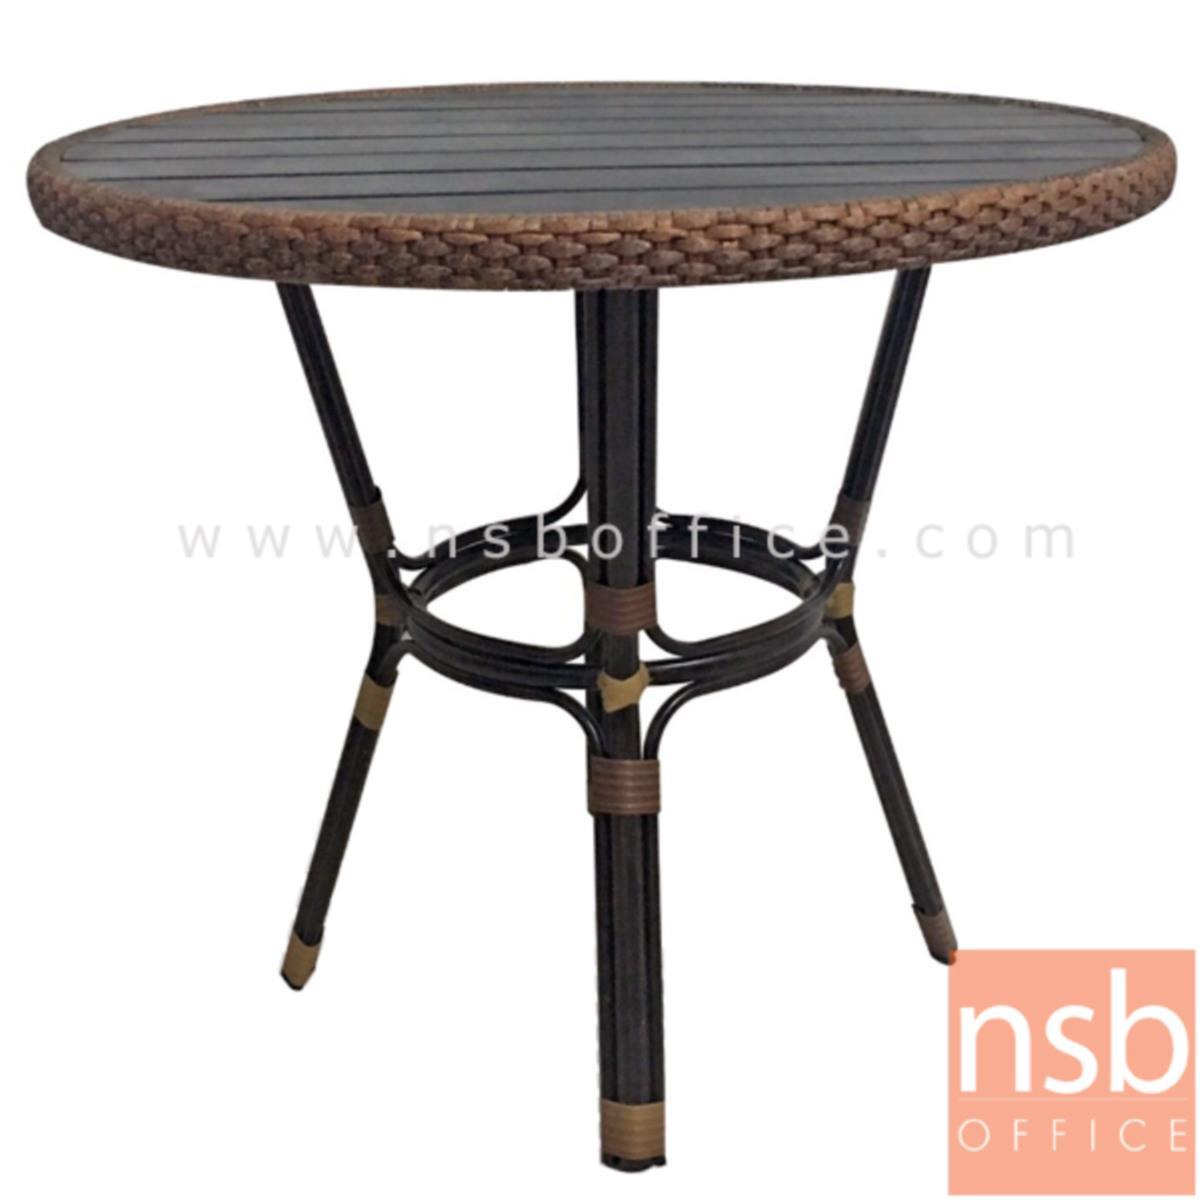 G08A236:โต๊ะหวายสานหน้ากลม 85W cm. หน้าไม้โพลีวูด รุ่น B-179 สีน้ำตาล